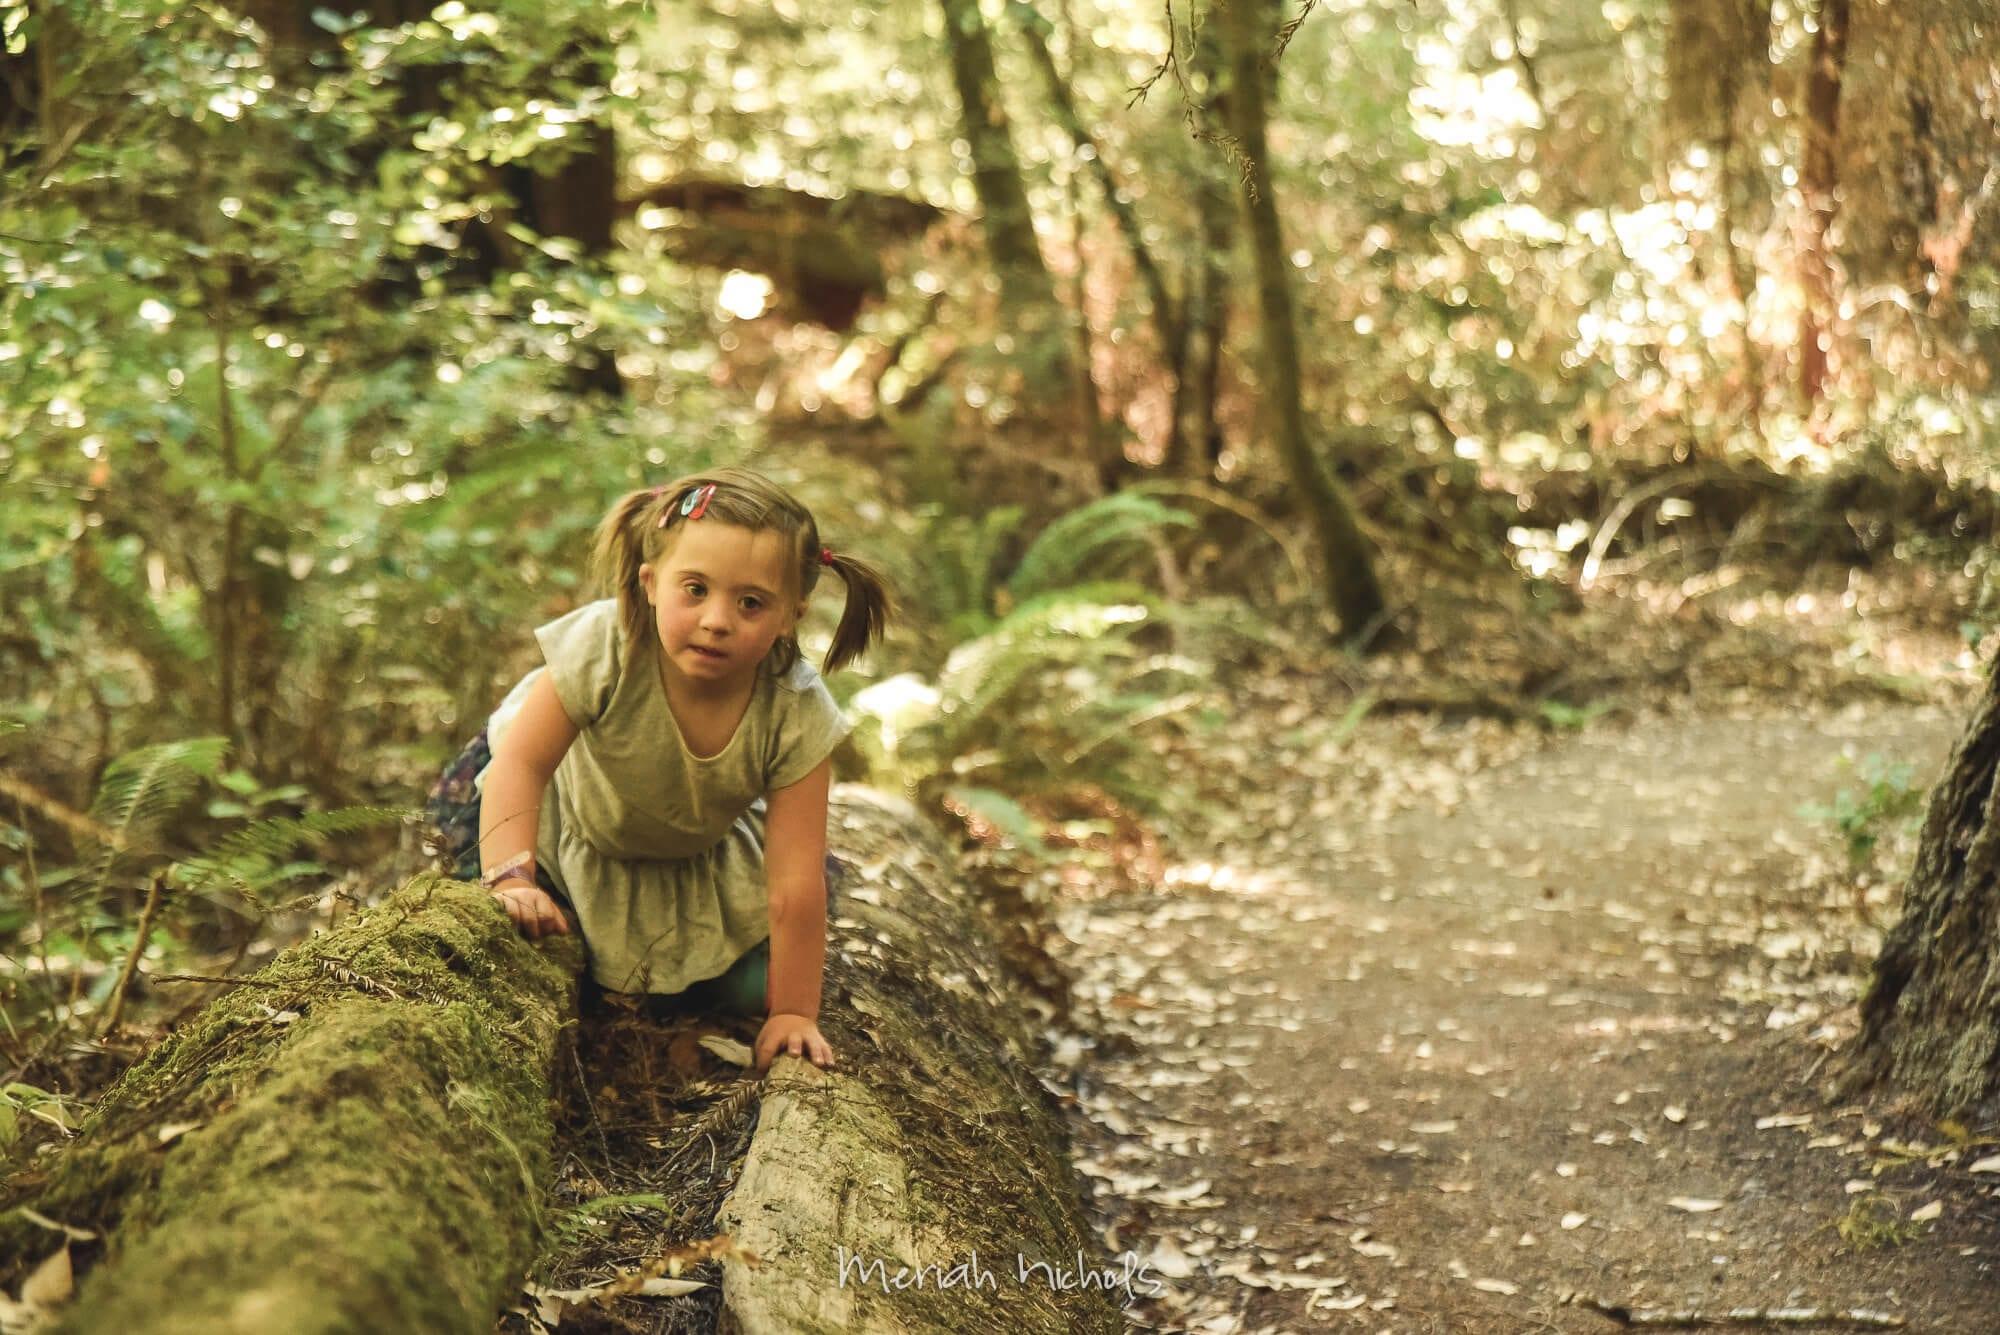 Meriah Nichols Redwoods-15